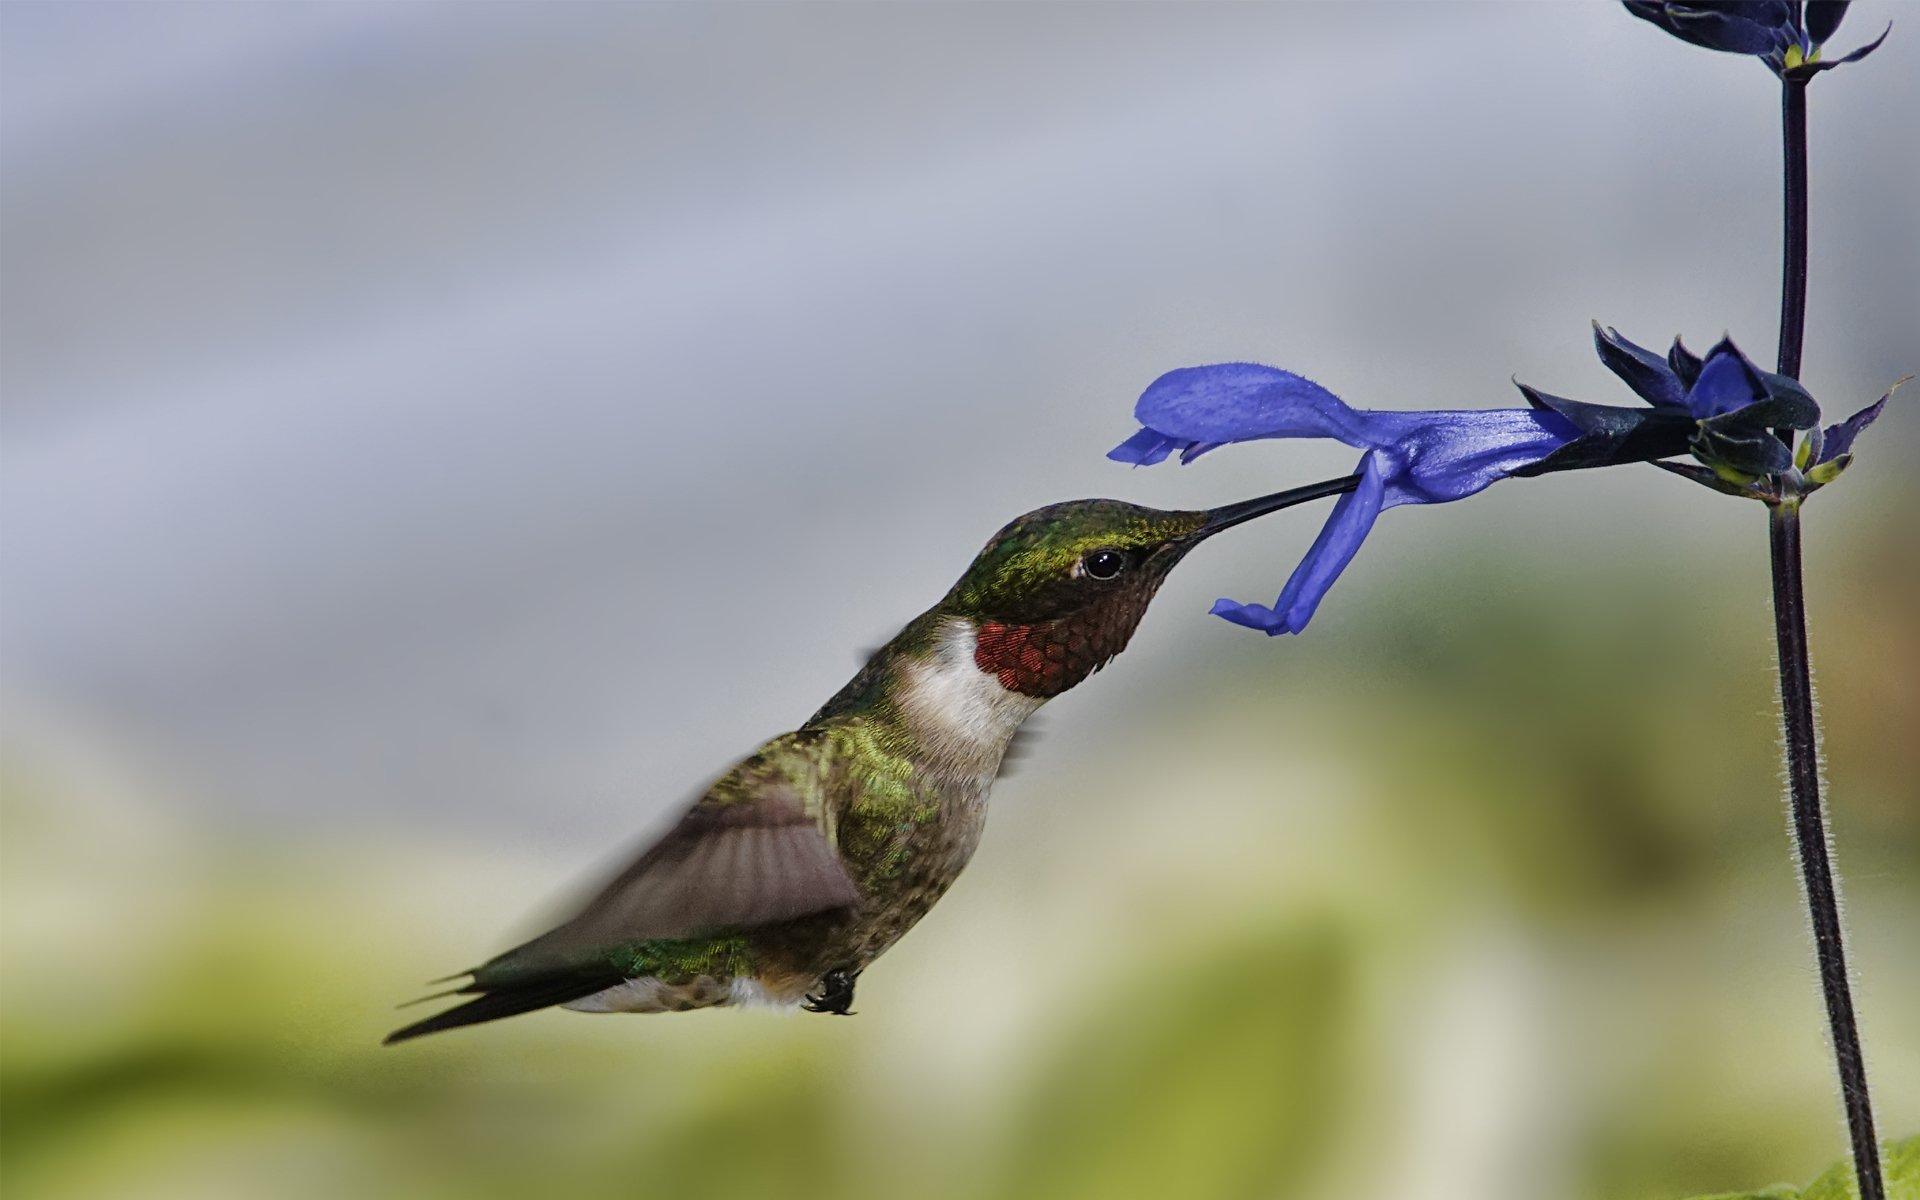 птица цветок  № 2034095 загрузить